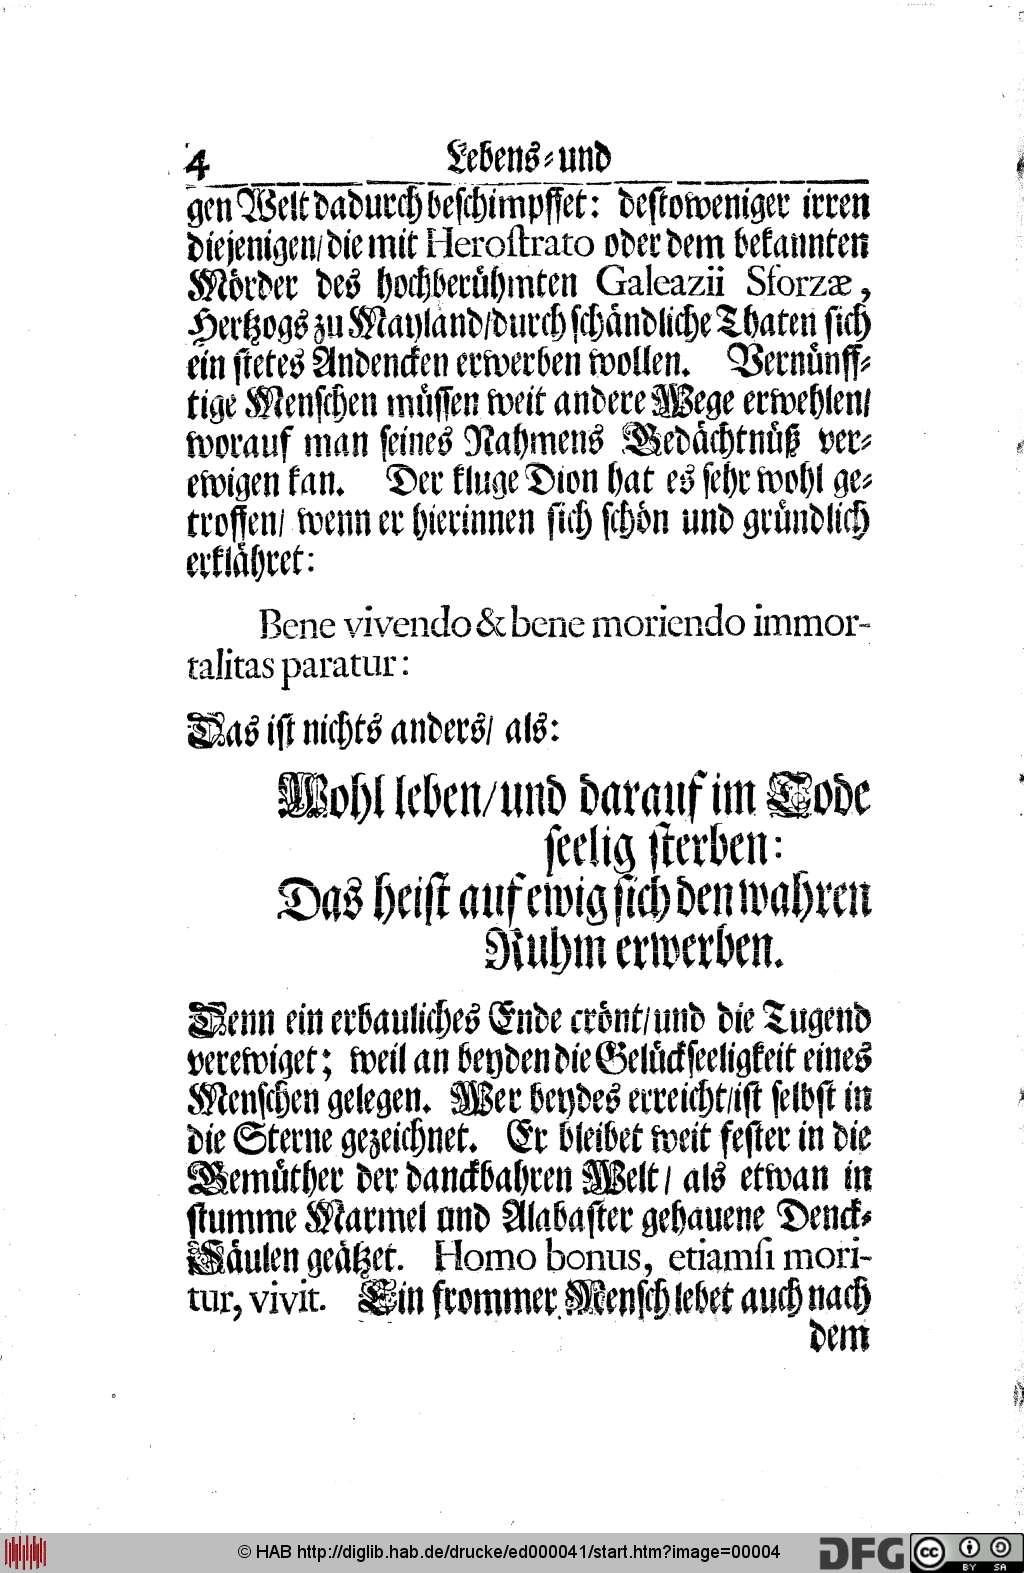 http://diglib.hab.de/drucke/ed000041/00004.jpg